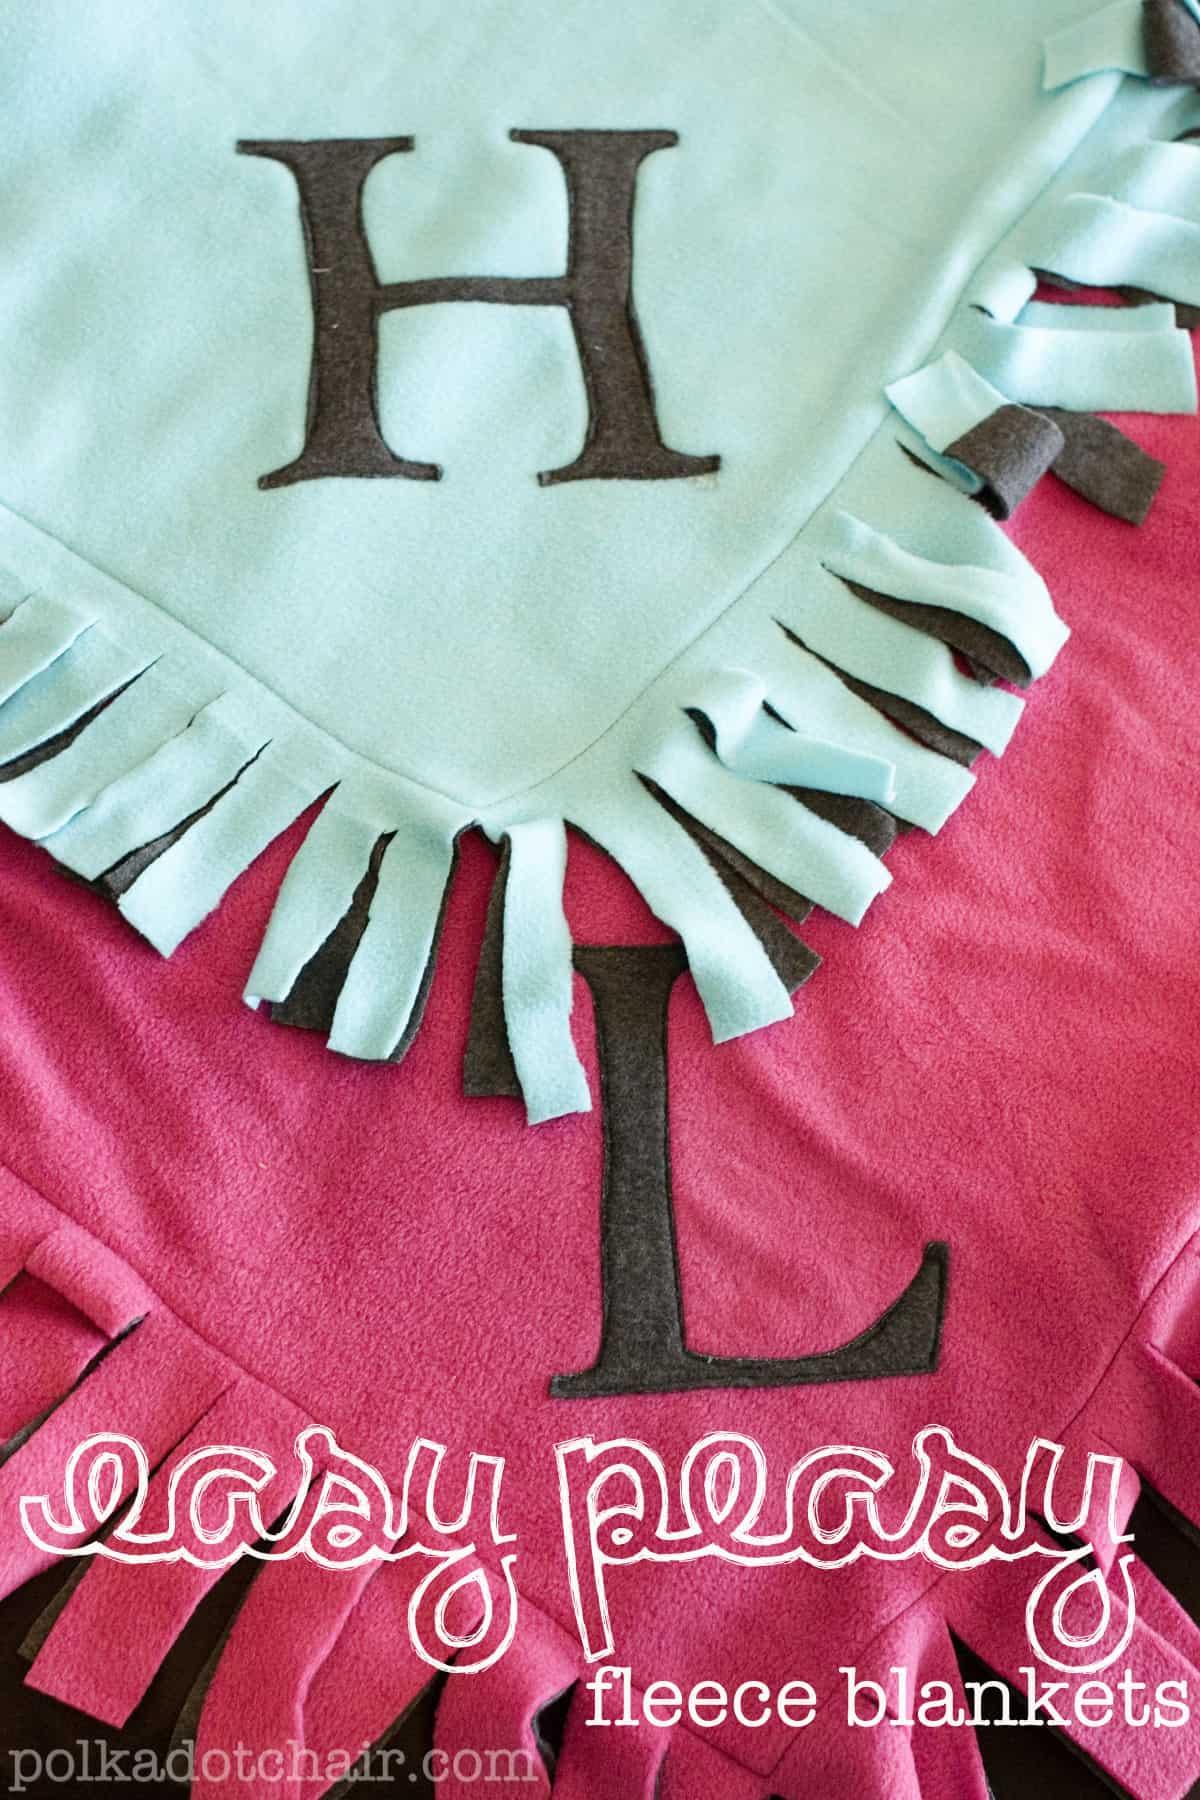 Easy knotted monogram fleece blankets